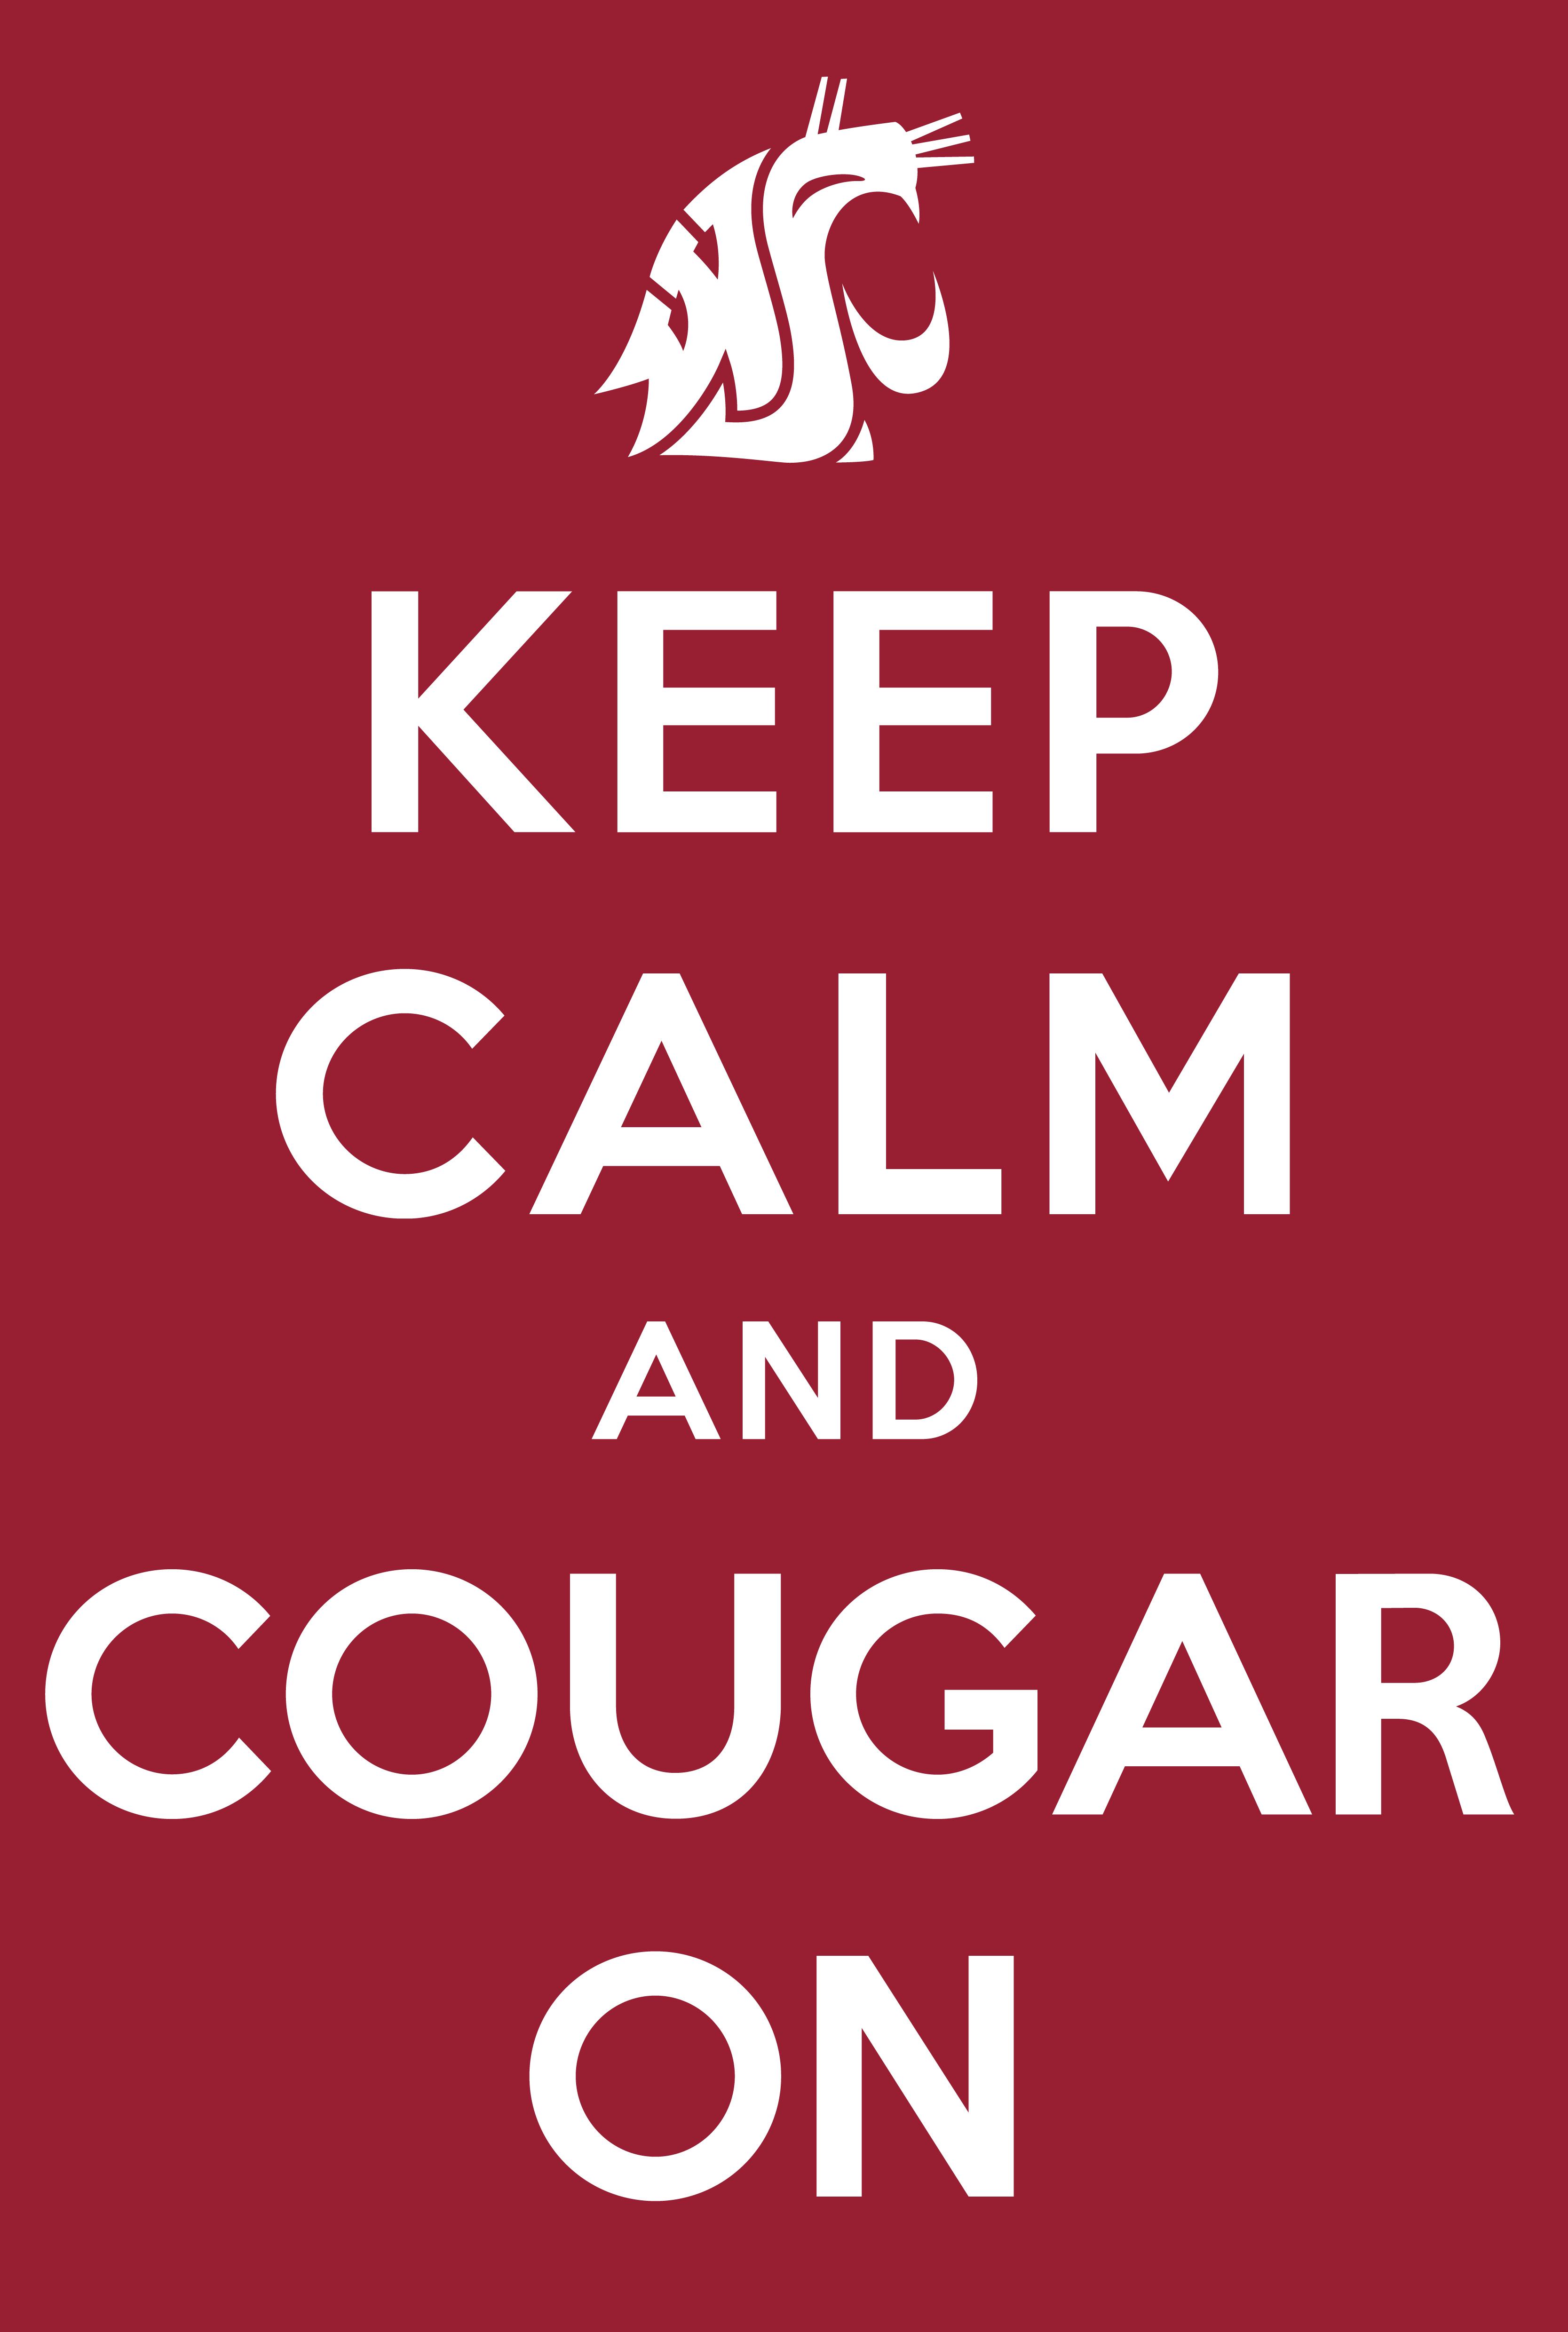 WSU Cougar Quote Haha Pinterest 3334x4959